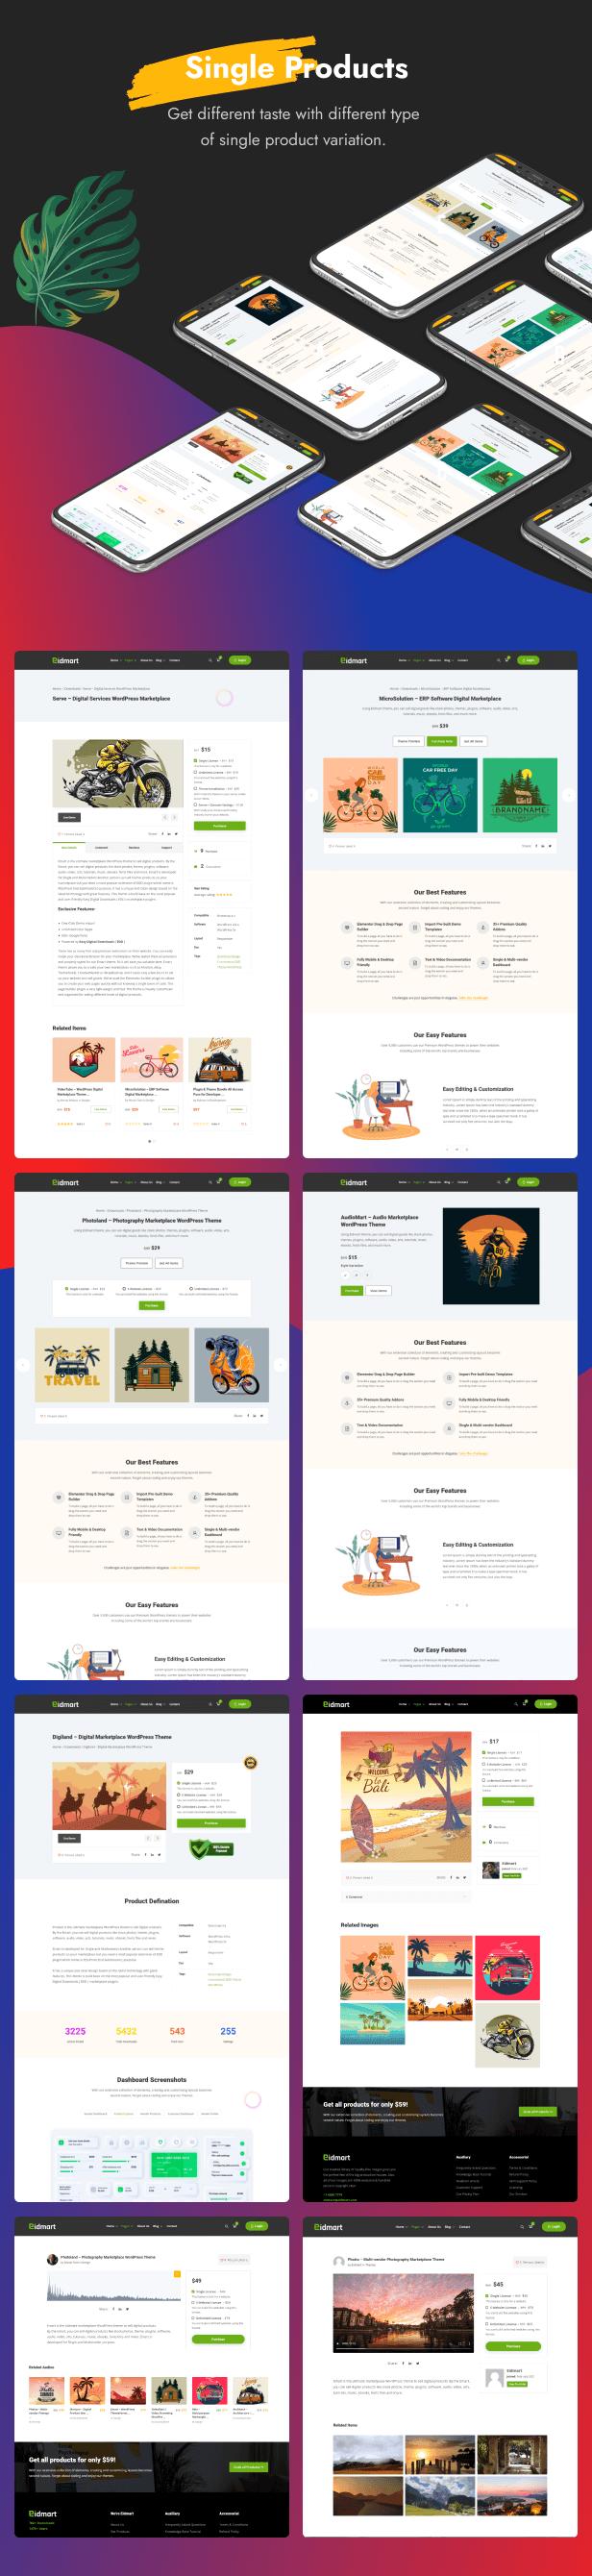 Eidmart | Digital Marketplace WordPress Theme